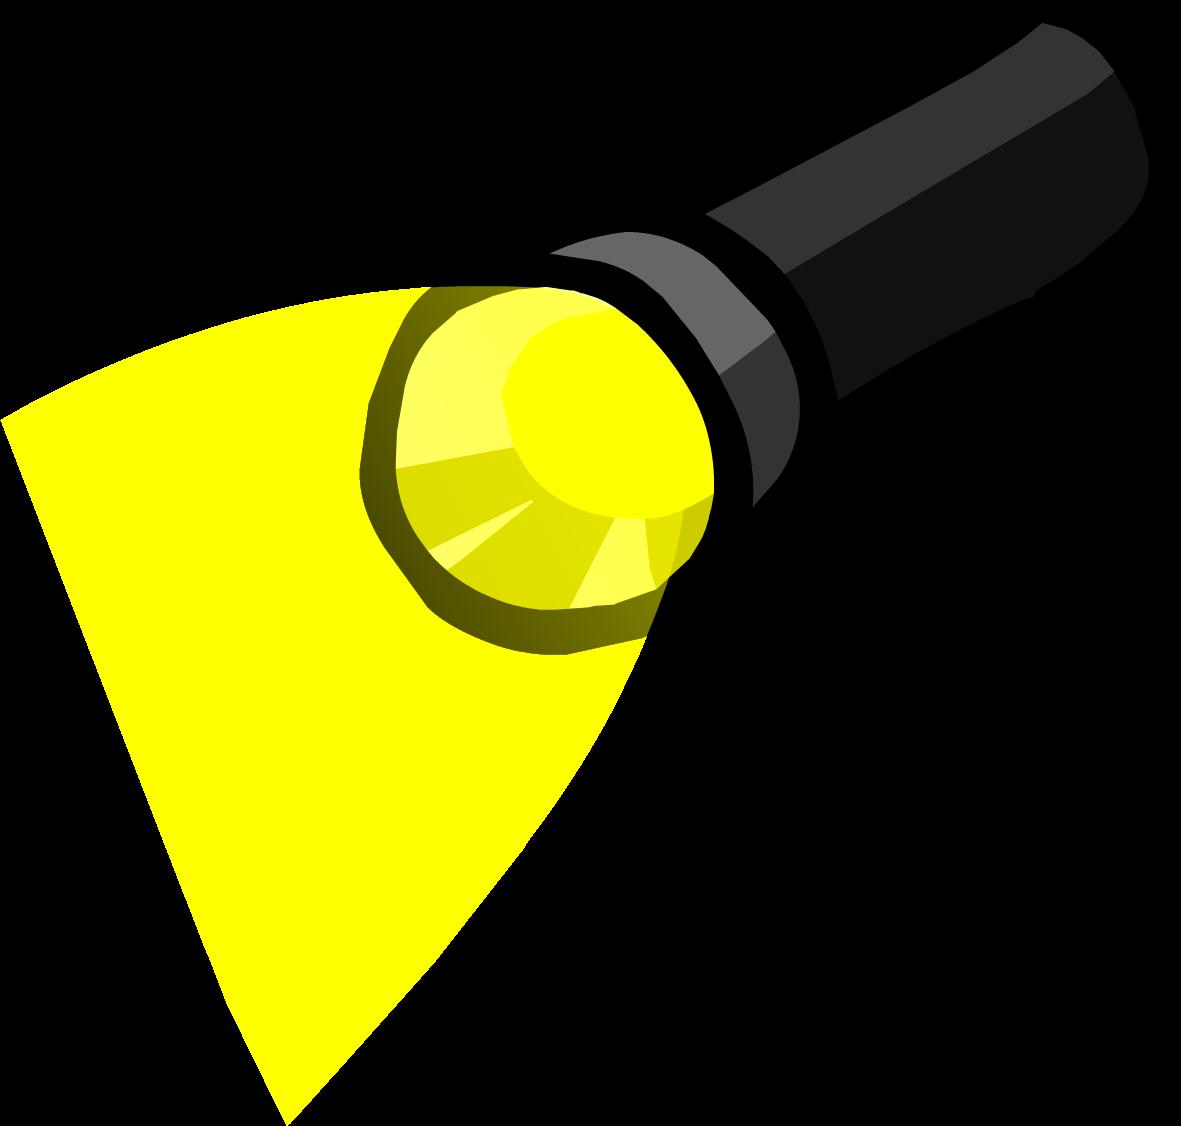 Club clipart torch. Flashlight penguin wiki fandom